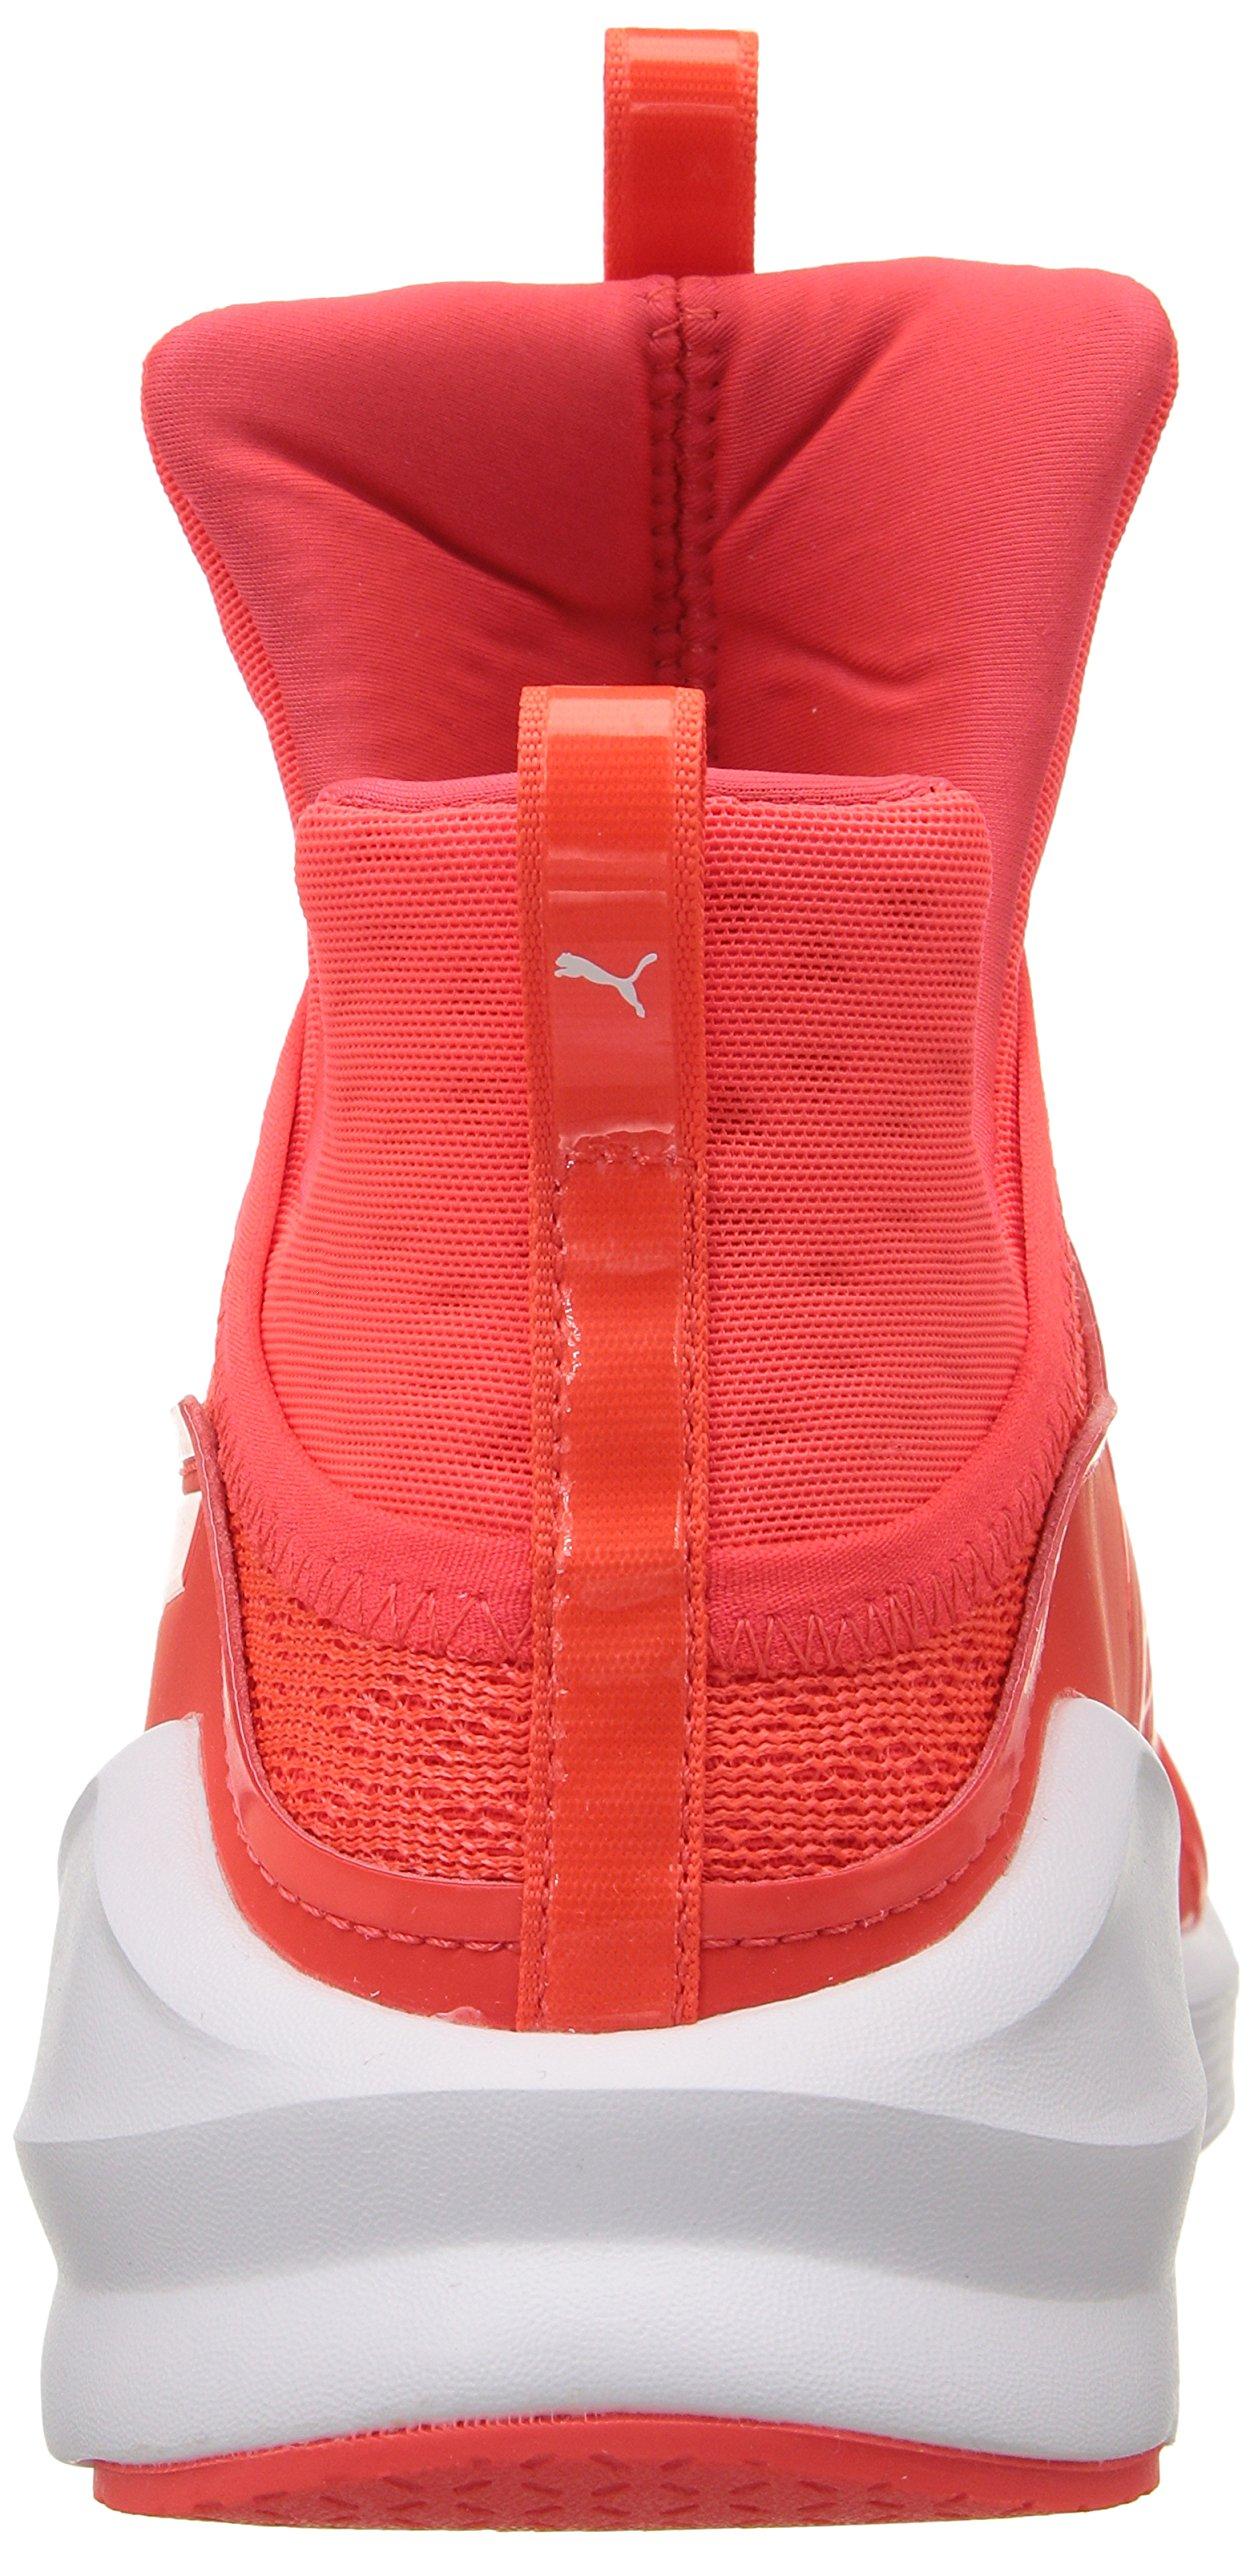 PUMA Women's Fierce Eng Mesh Cross-Trainer Shoe, Red Blast White, 5.5 M US by PUMA (Image #2)